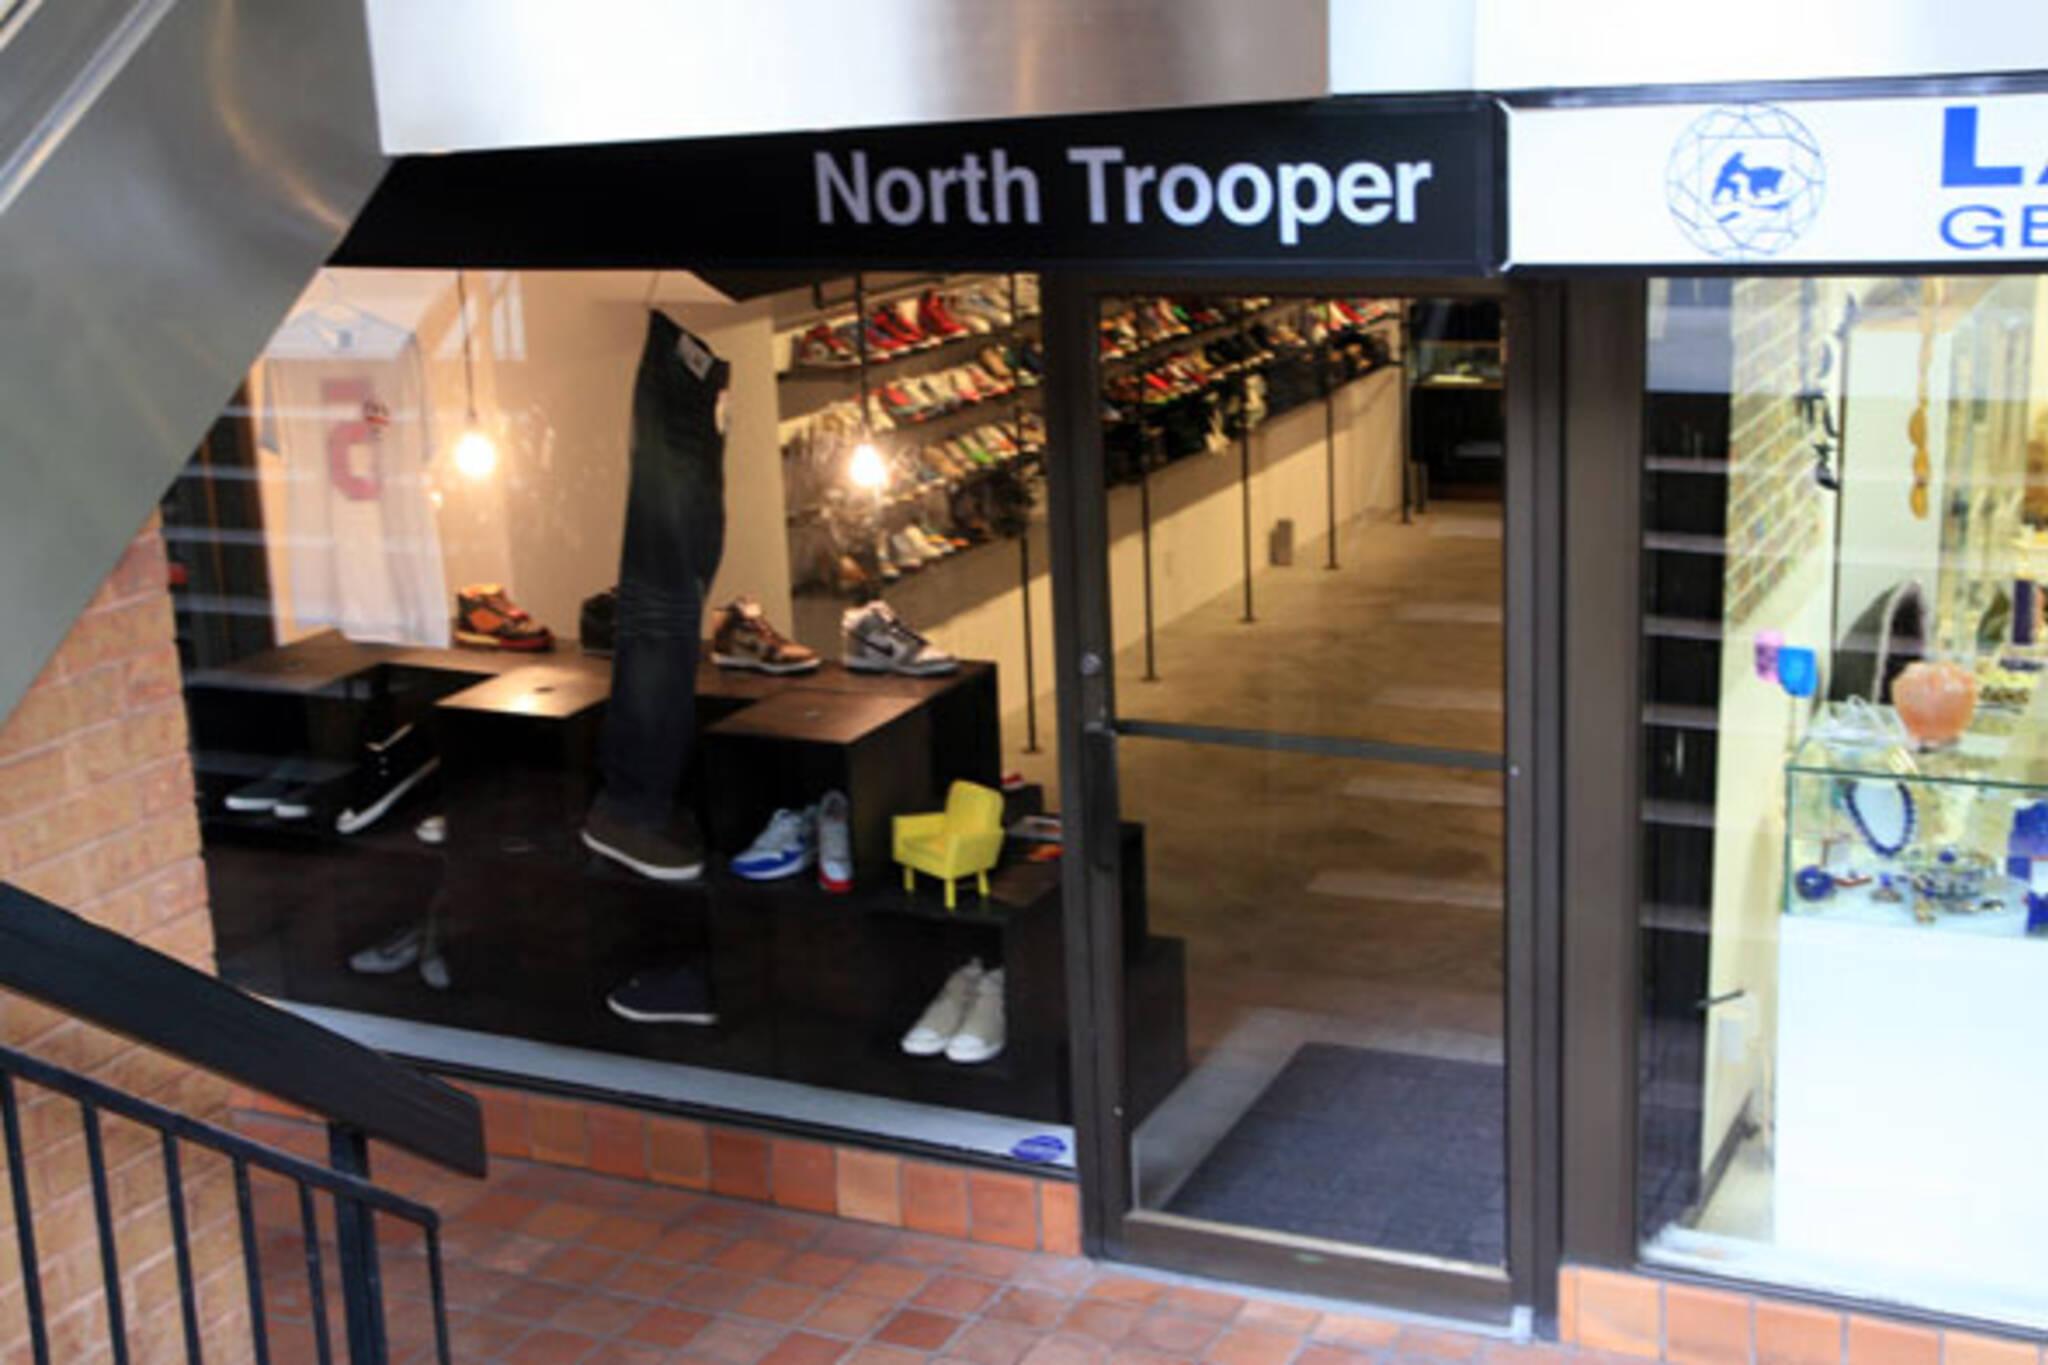 North Trooper